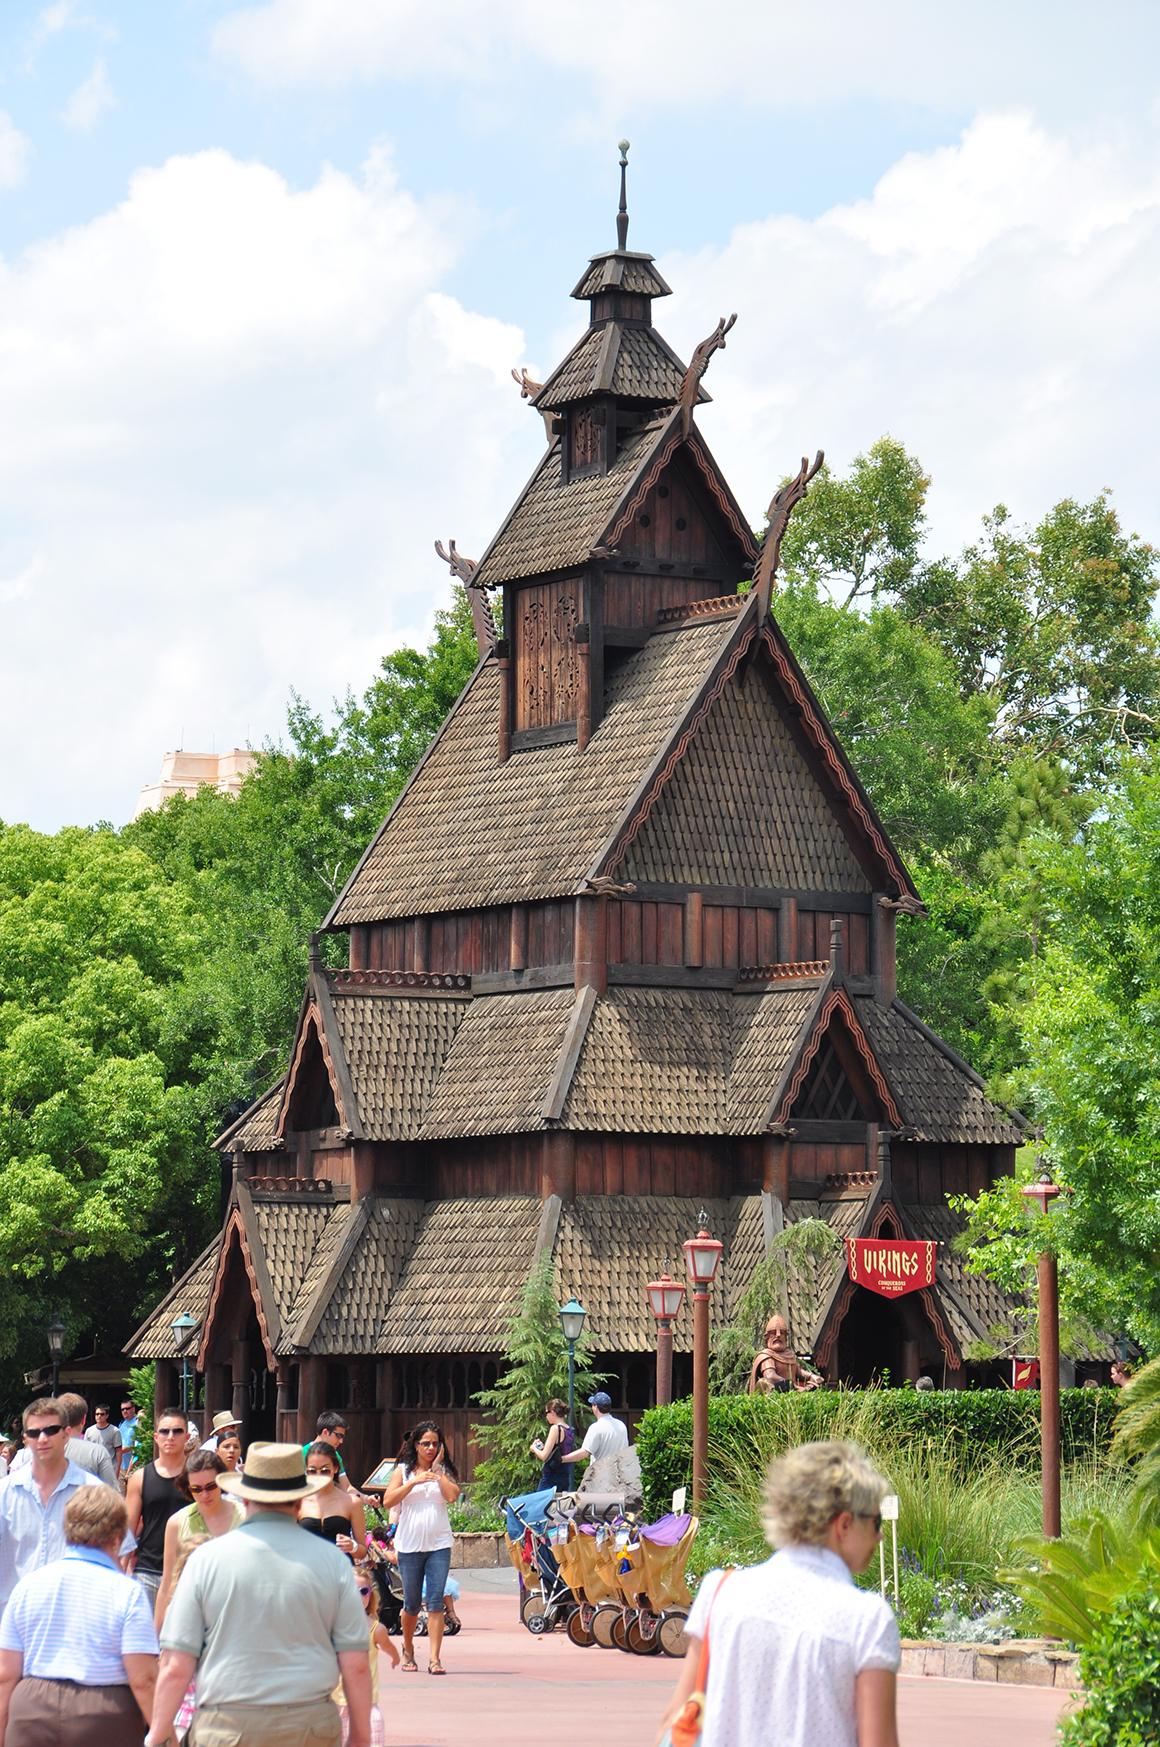 Gol stave church replica, Epcot